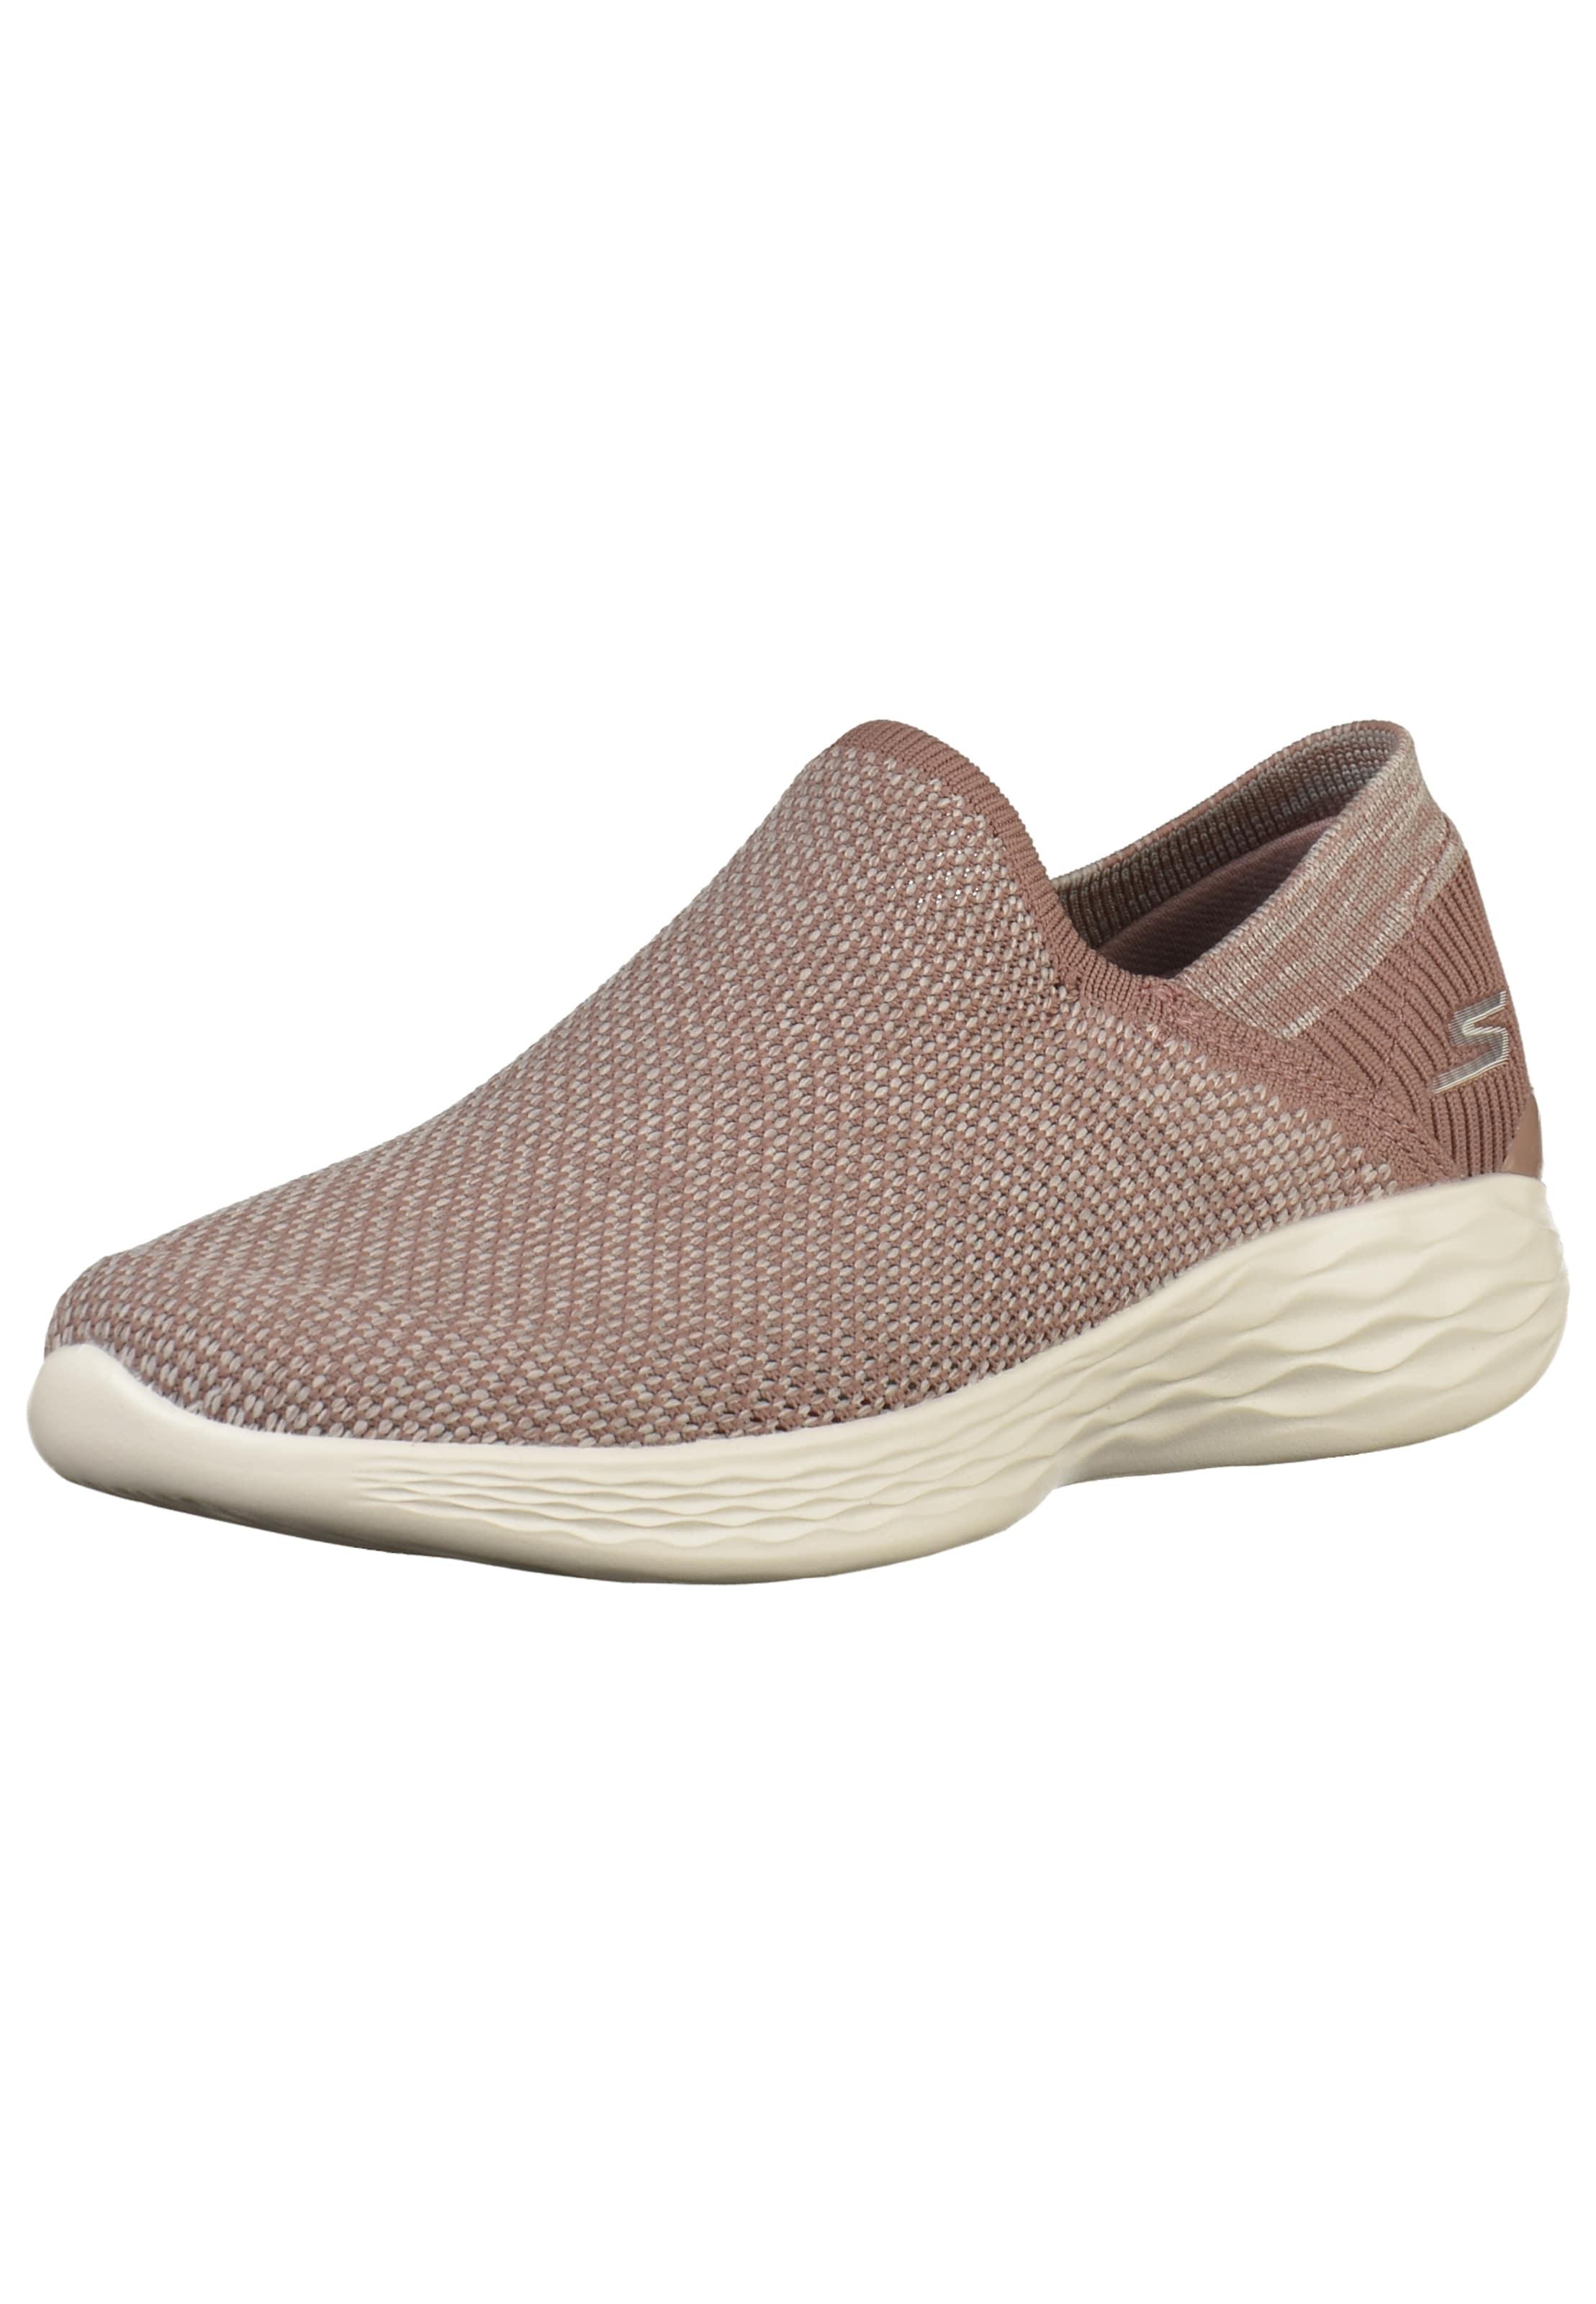 Haltbare Mode billige Schuhe SKECHERS | Slipper Schuhe Gut getragene Schuhe